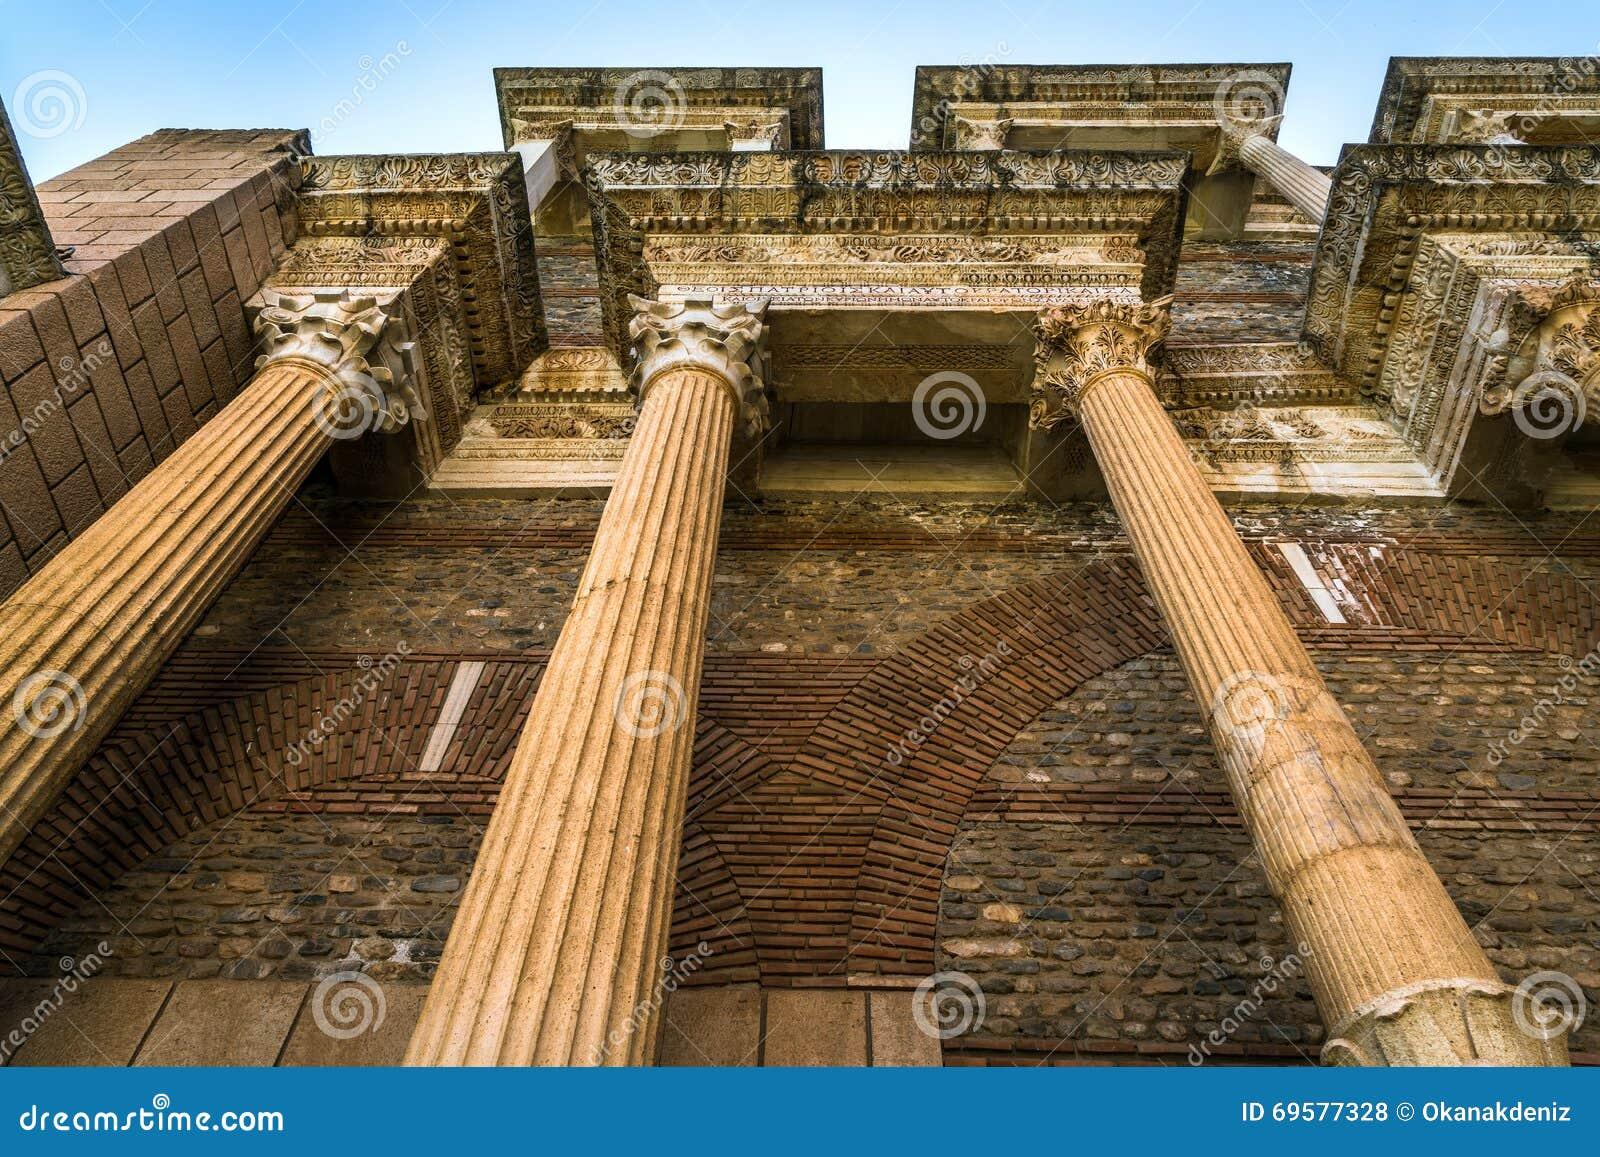 File:The Byzantine Shops, Sardis (Lydia), TurkeySardis